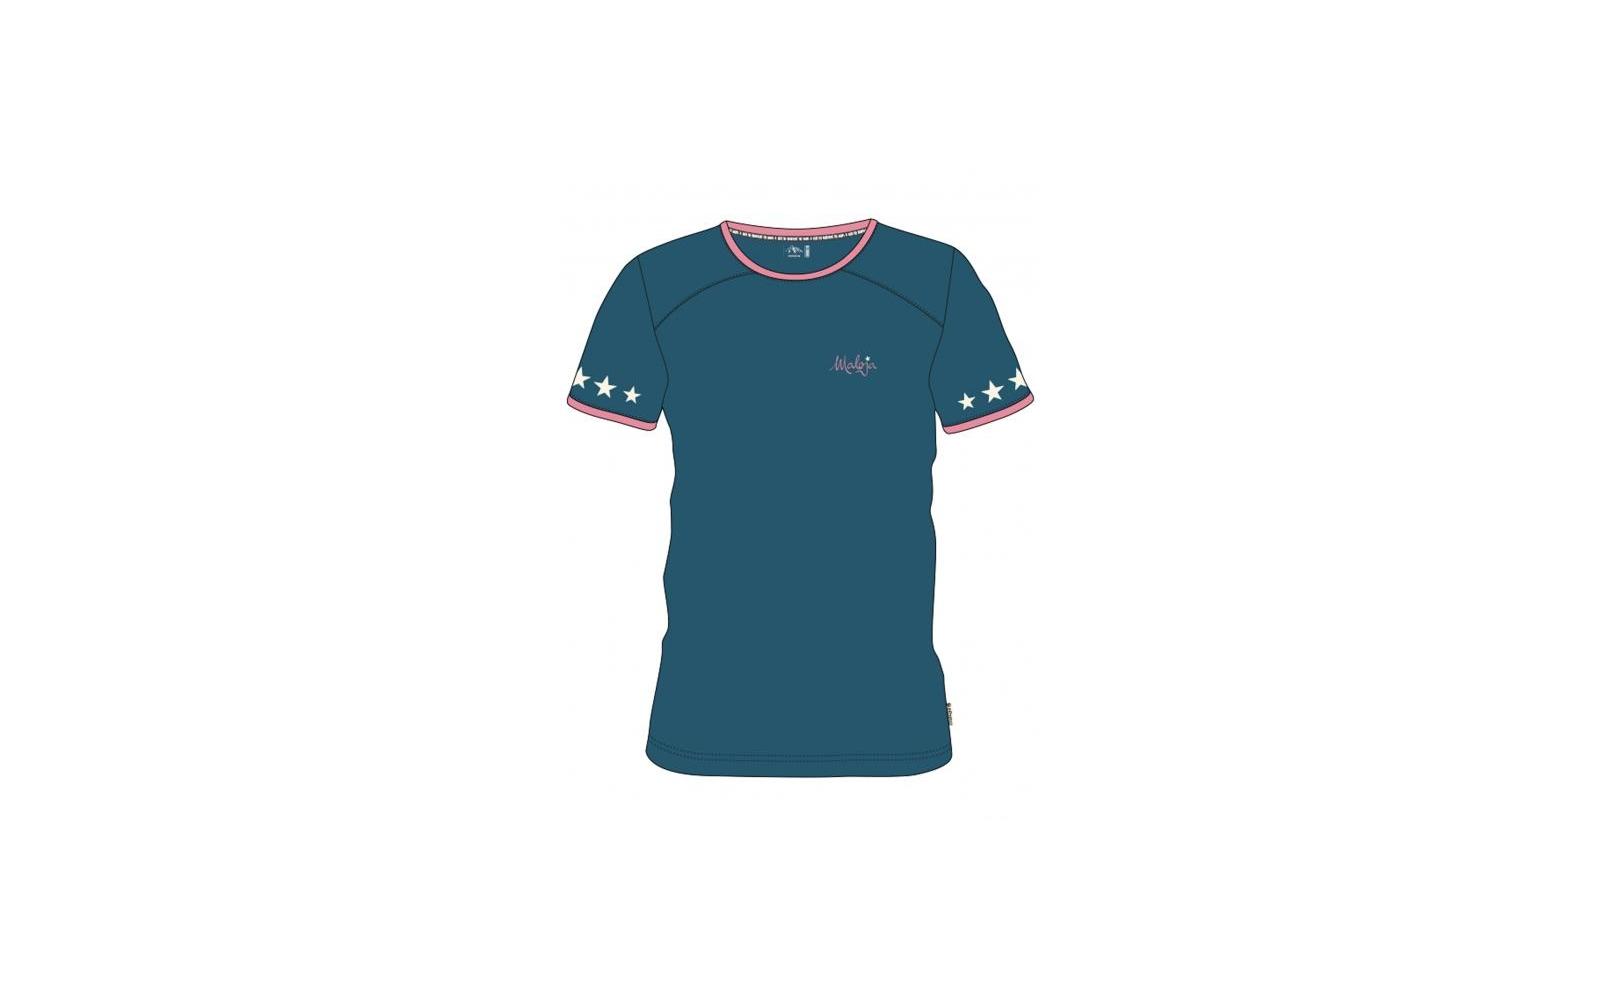 Maloja MariaM Short Sleeve Multisport Jersey L blueberry V4yZaS38Kc